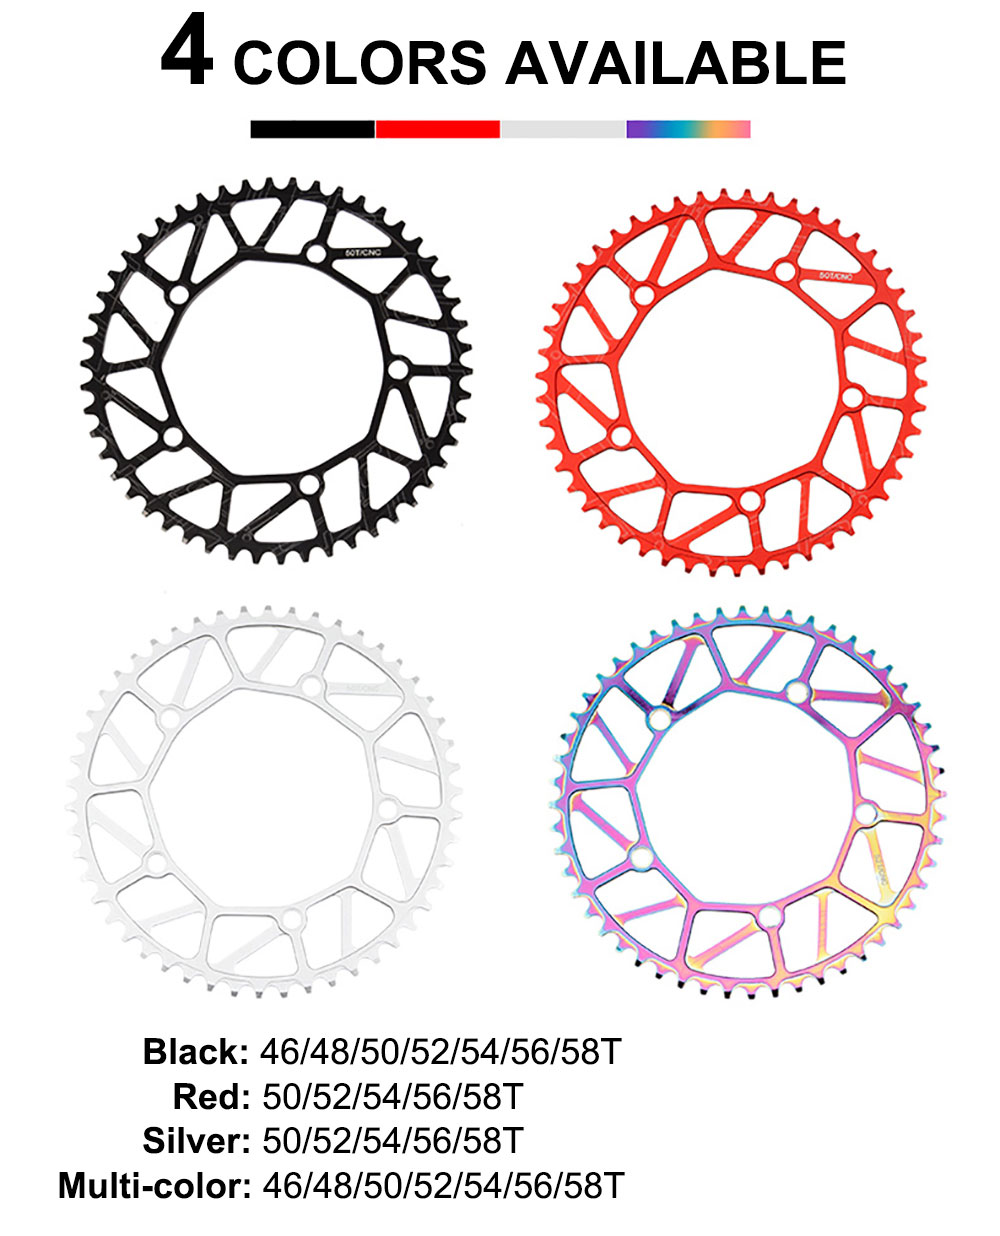 LP-folding-bike-chainring_03